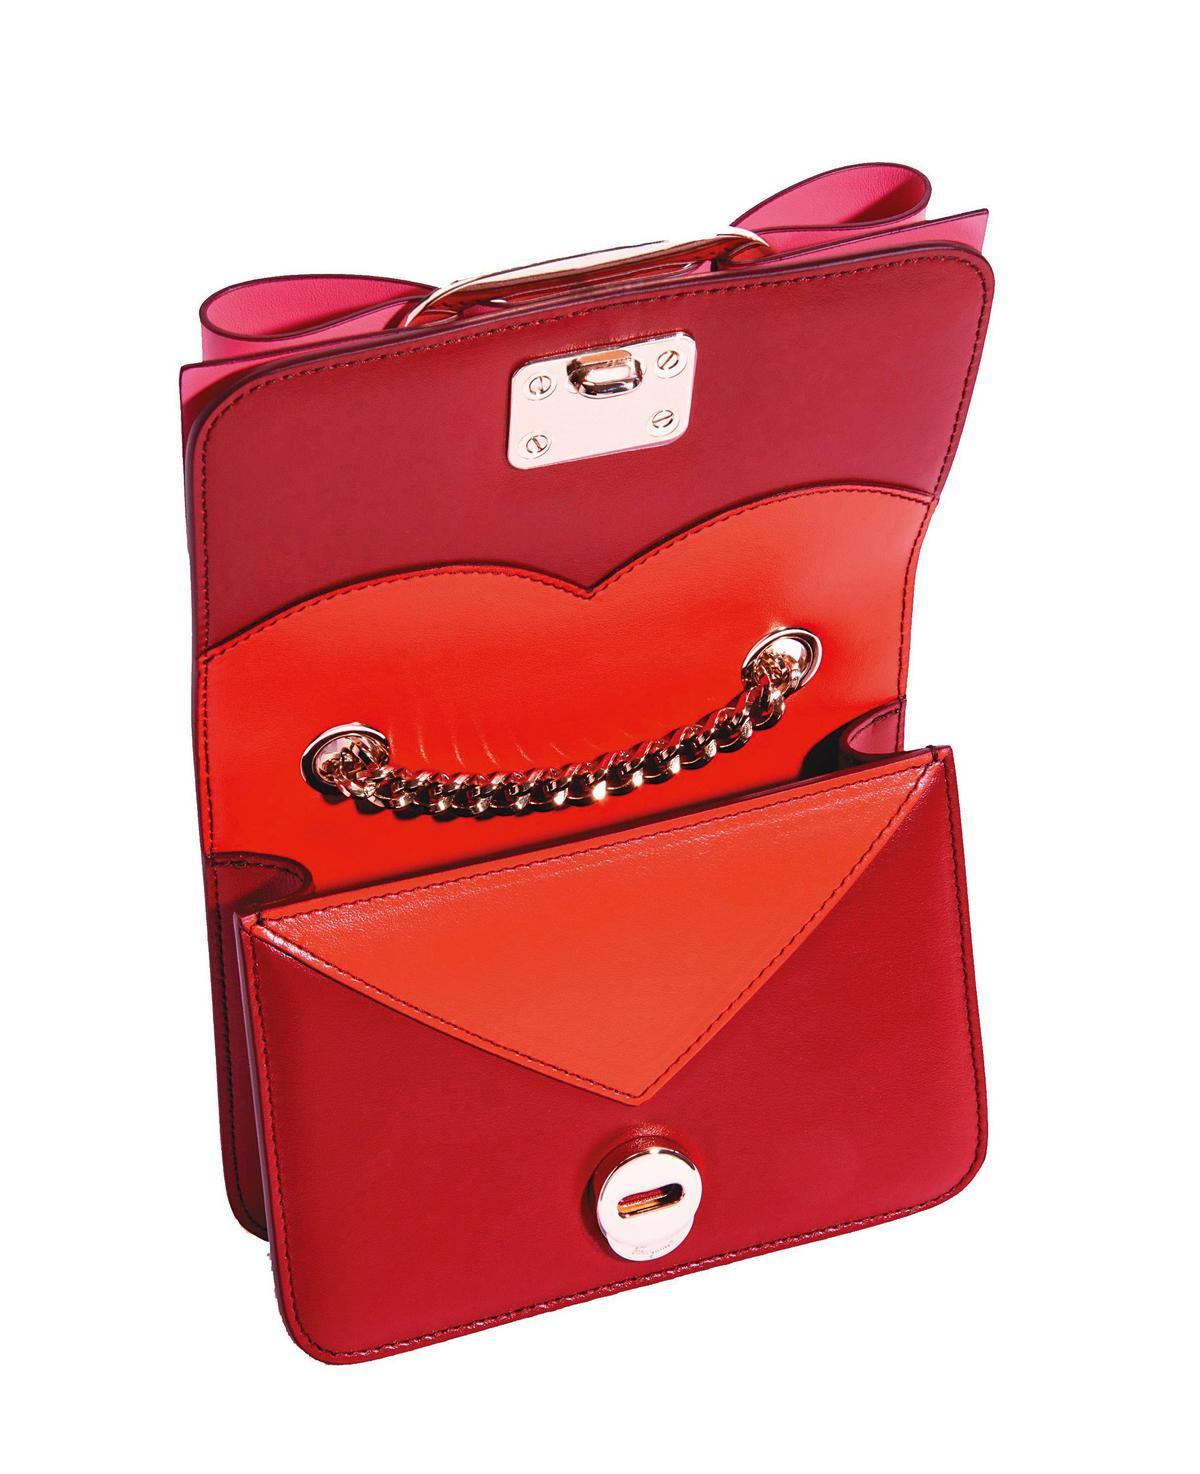 VARA紅色與粉色牛皮蝴蝶結包 NT$43,900(Salvatore Ferragamo提供)